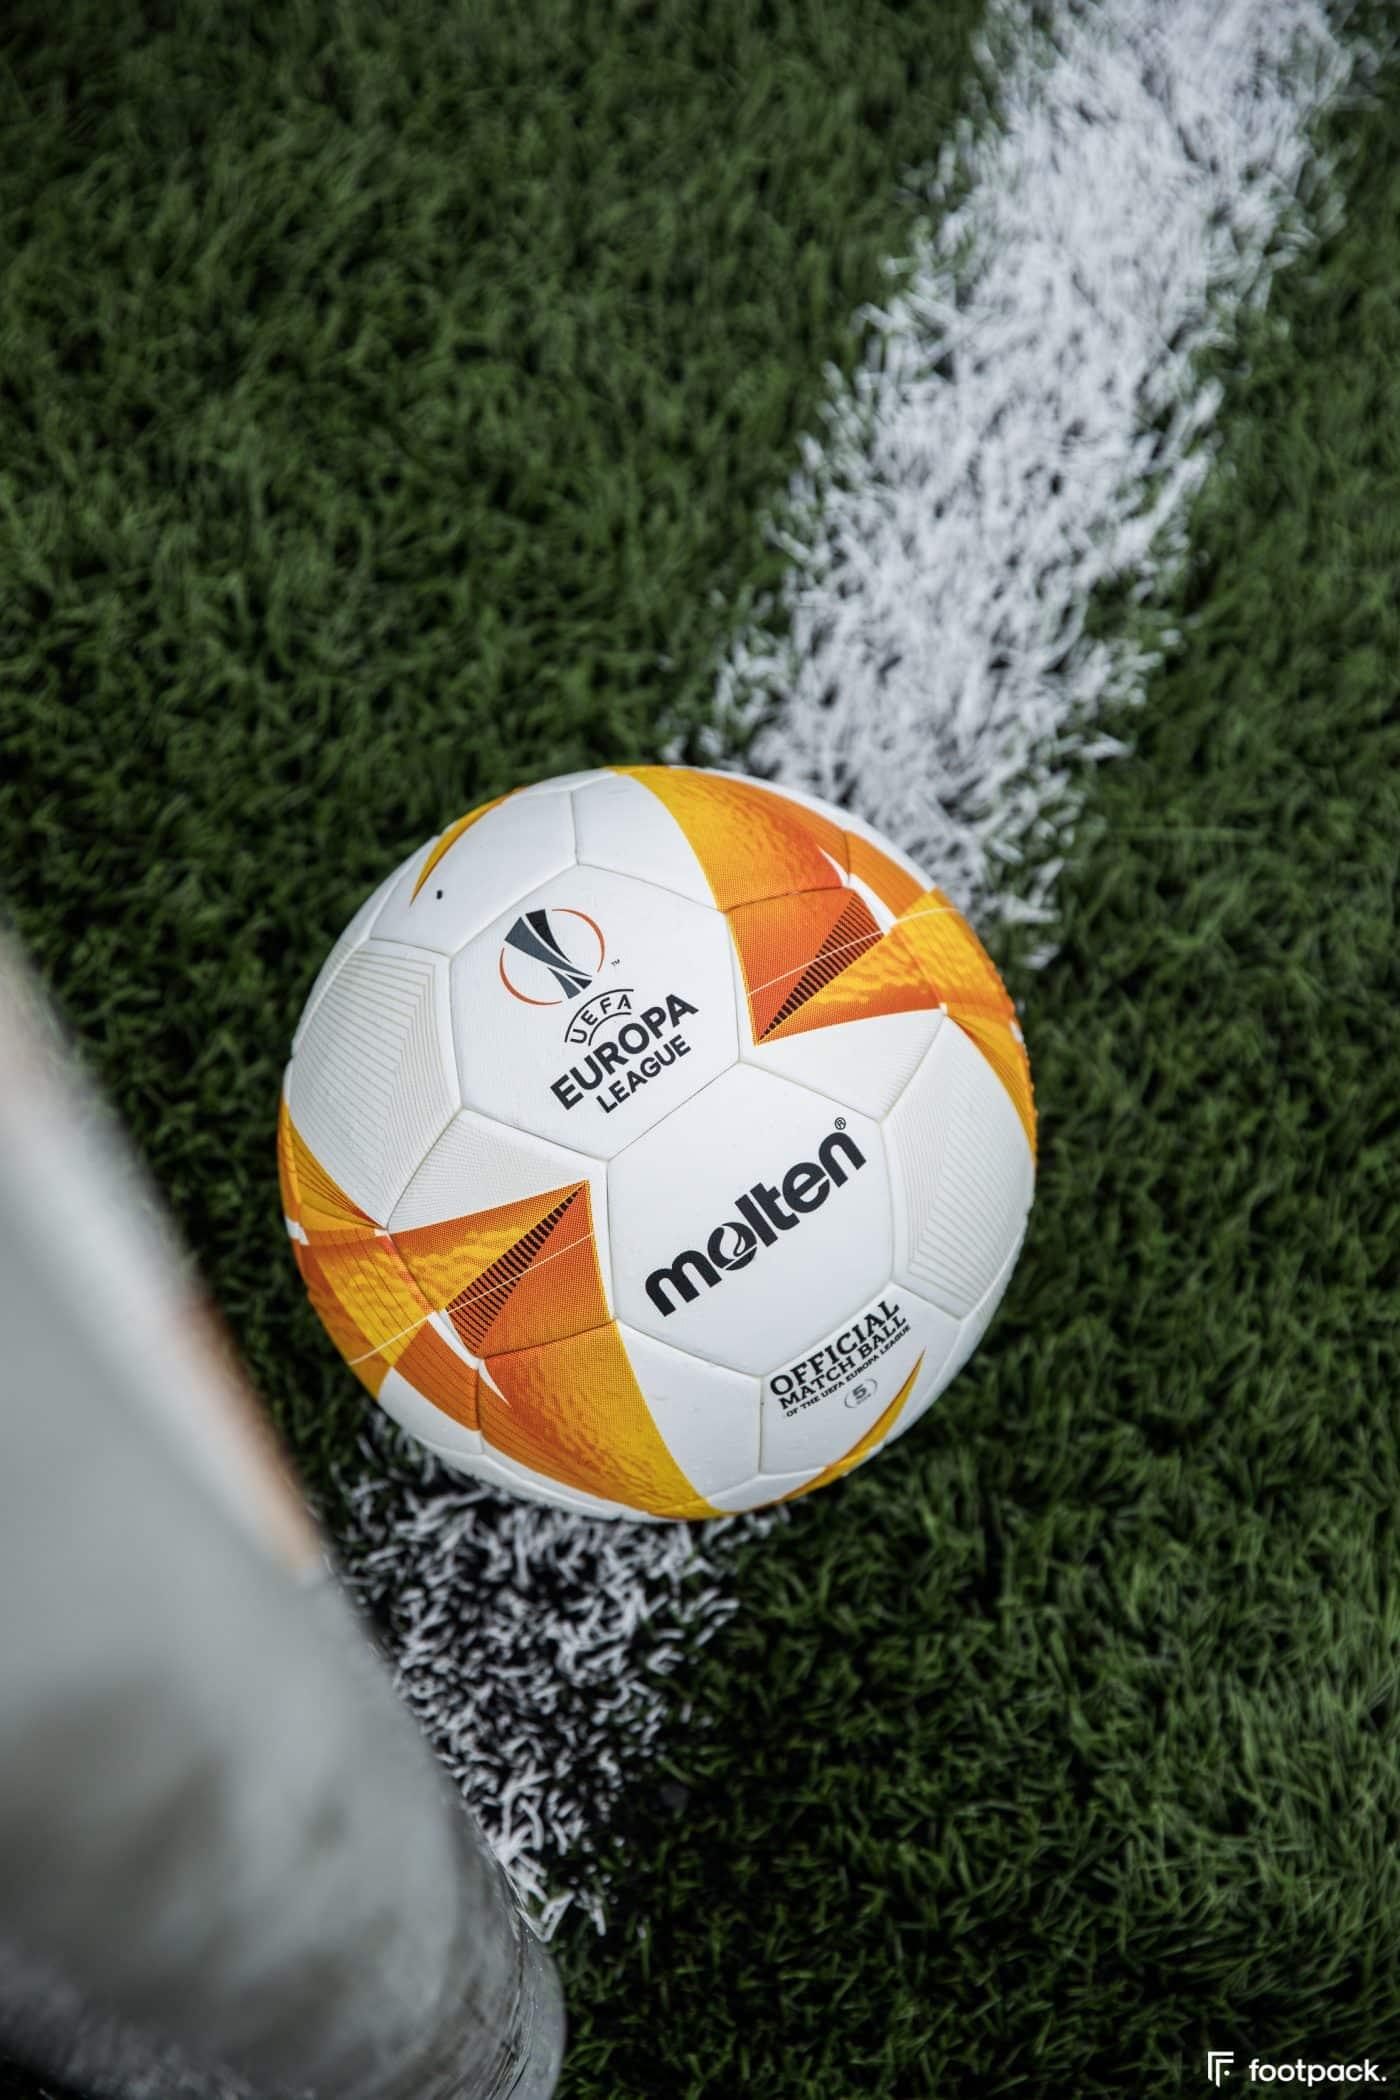 ballon-europa-league-2020-2021-footpack-3